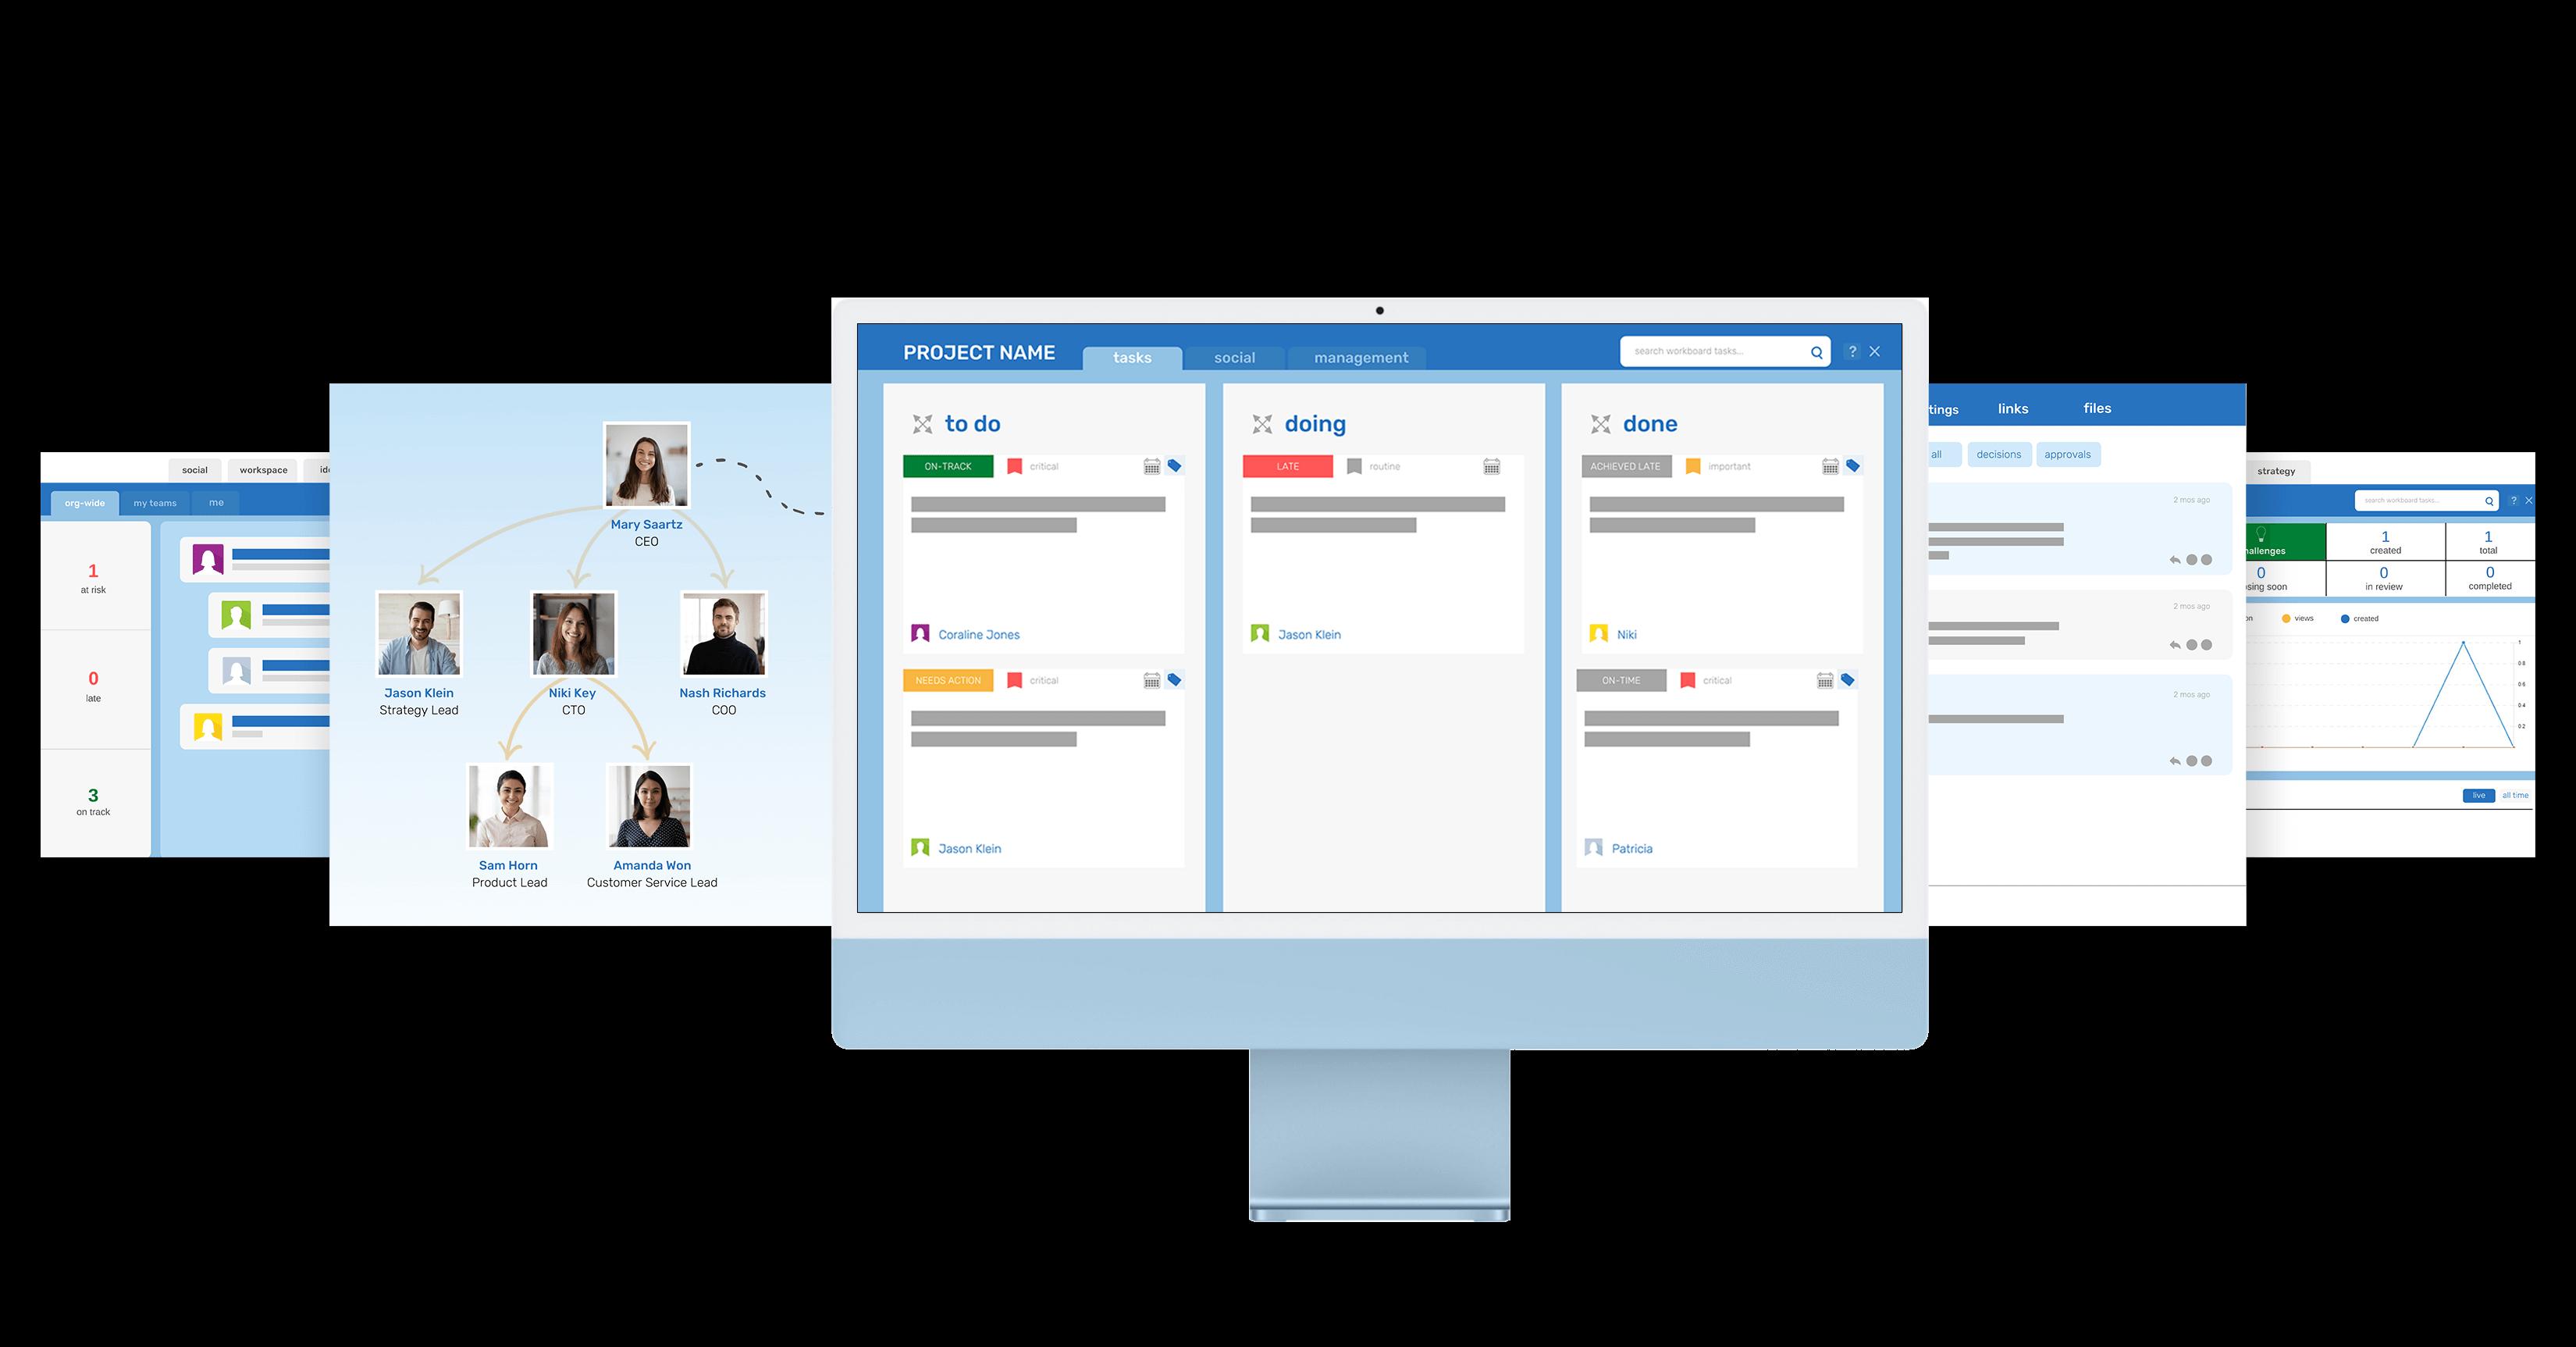 15-in-1 agile digital workplace